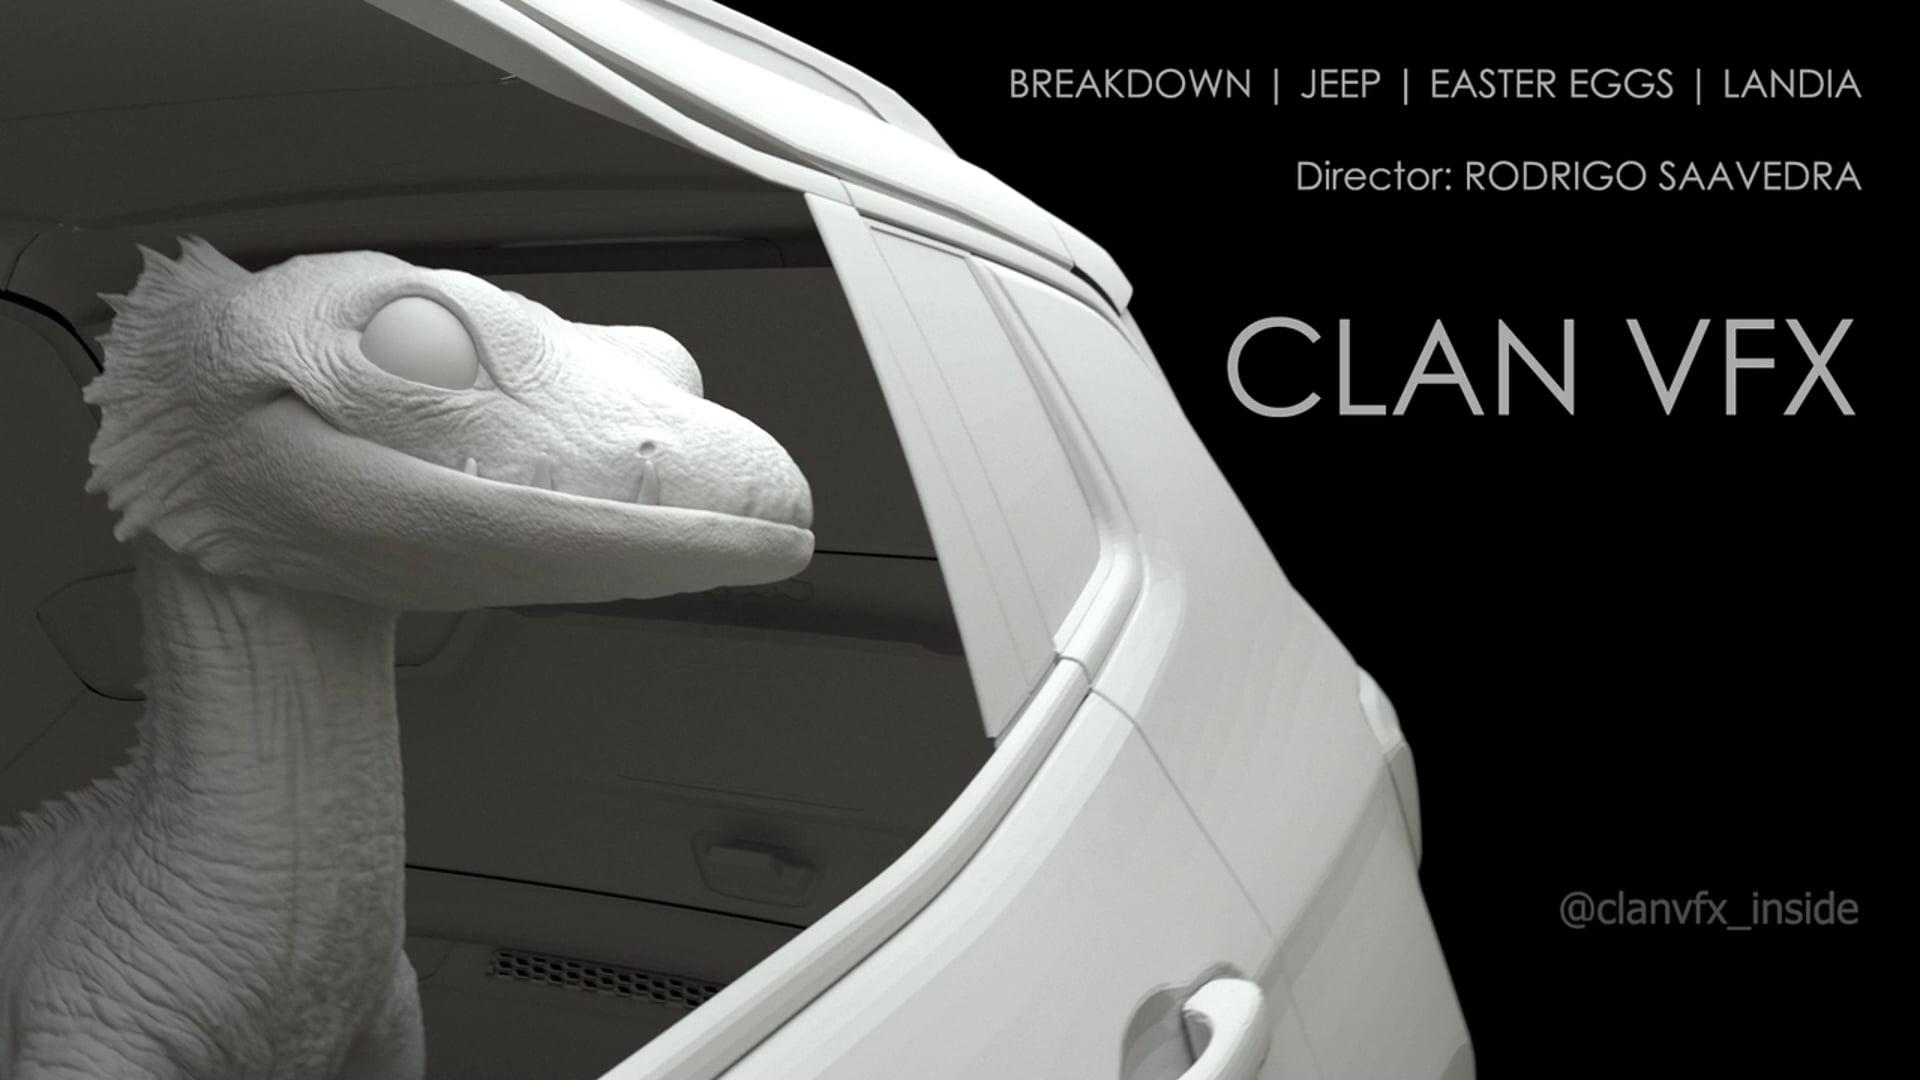 VFX Breakdown | Jeep | Easter Eggs | Landia | CLAN VFX